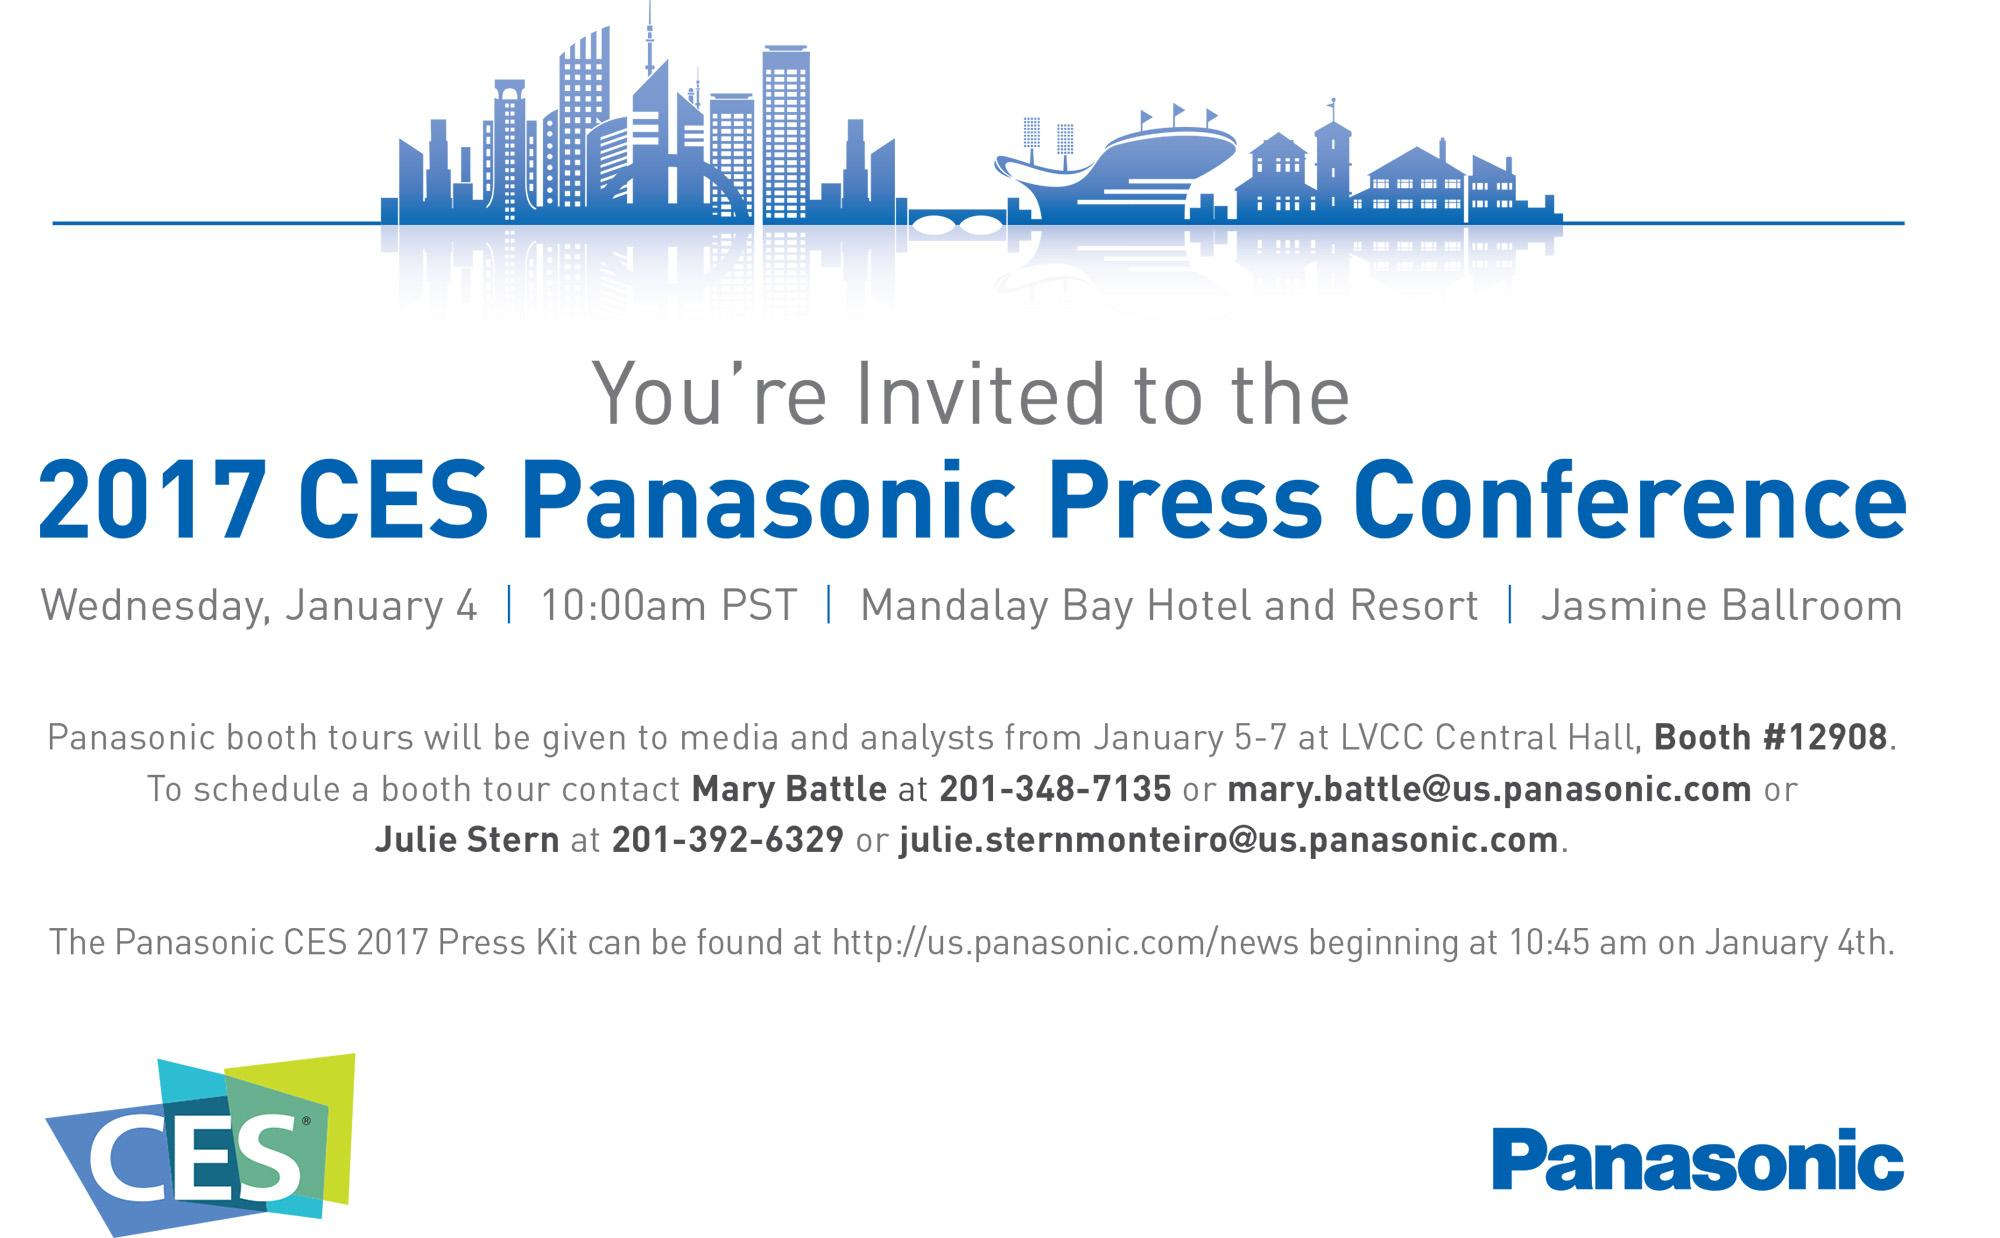 MEDIA ALERT: Panasonic at CES 2017 | CES2017 Panasonic Booth Highlghts | Panasonic Newsroom Global